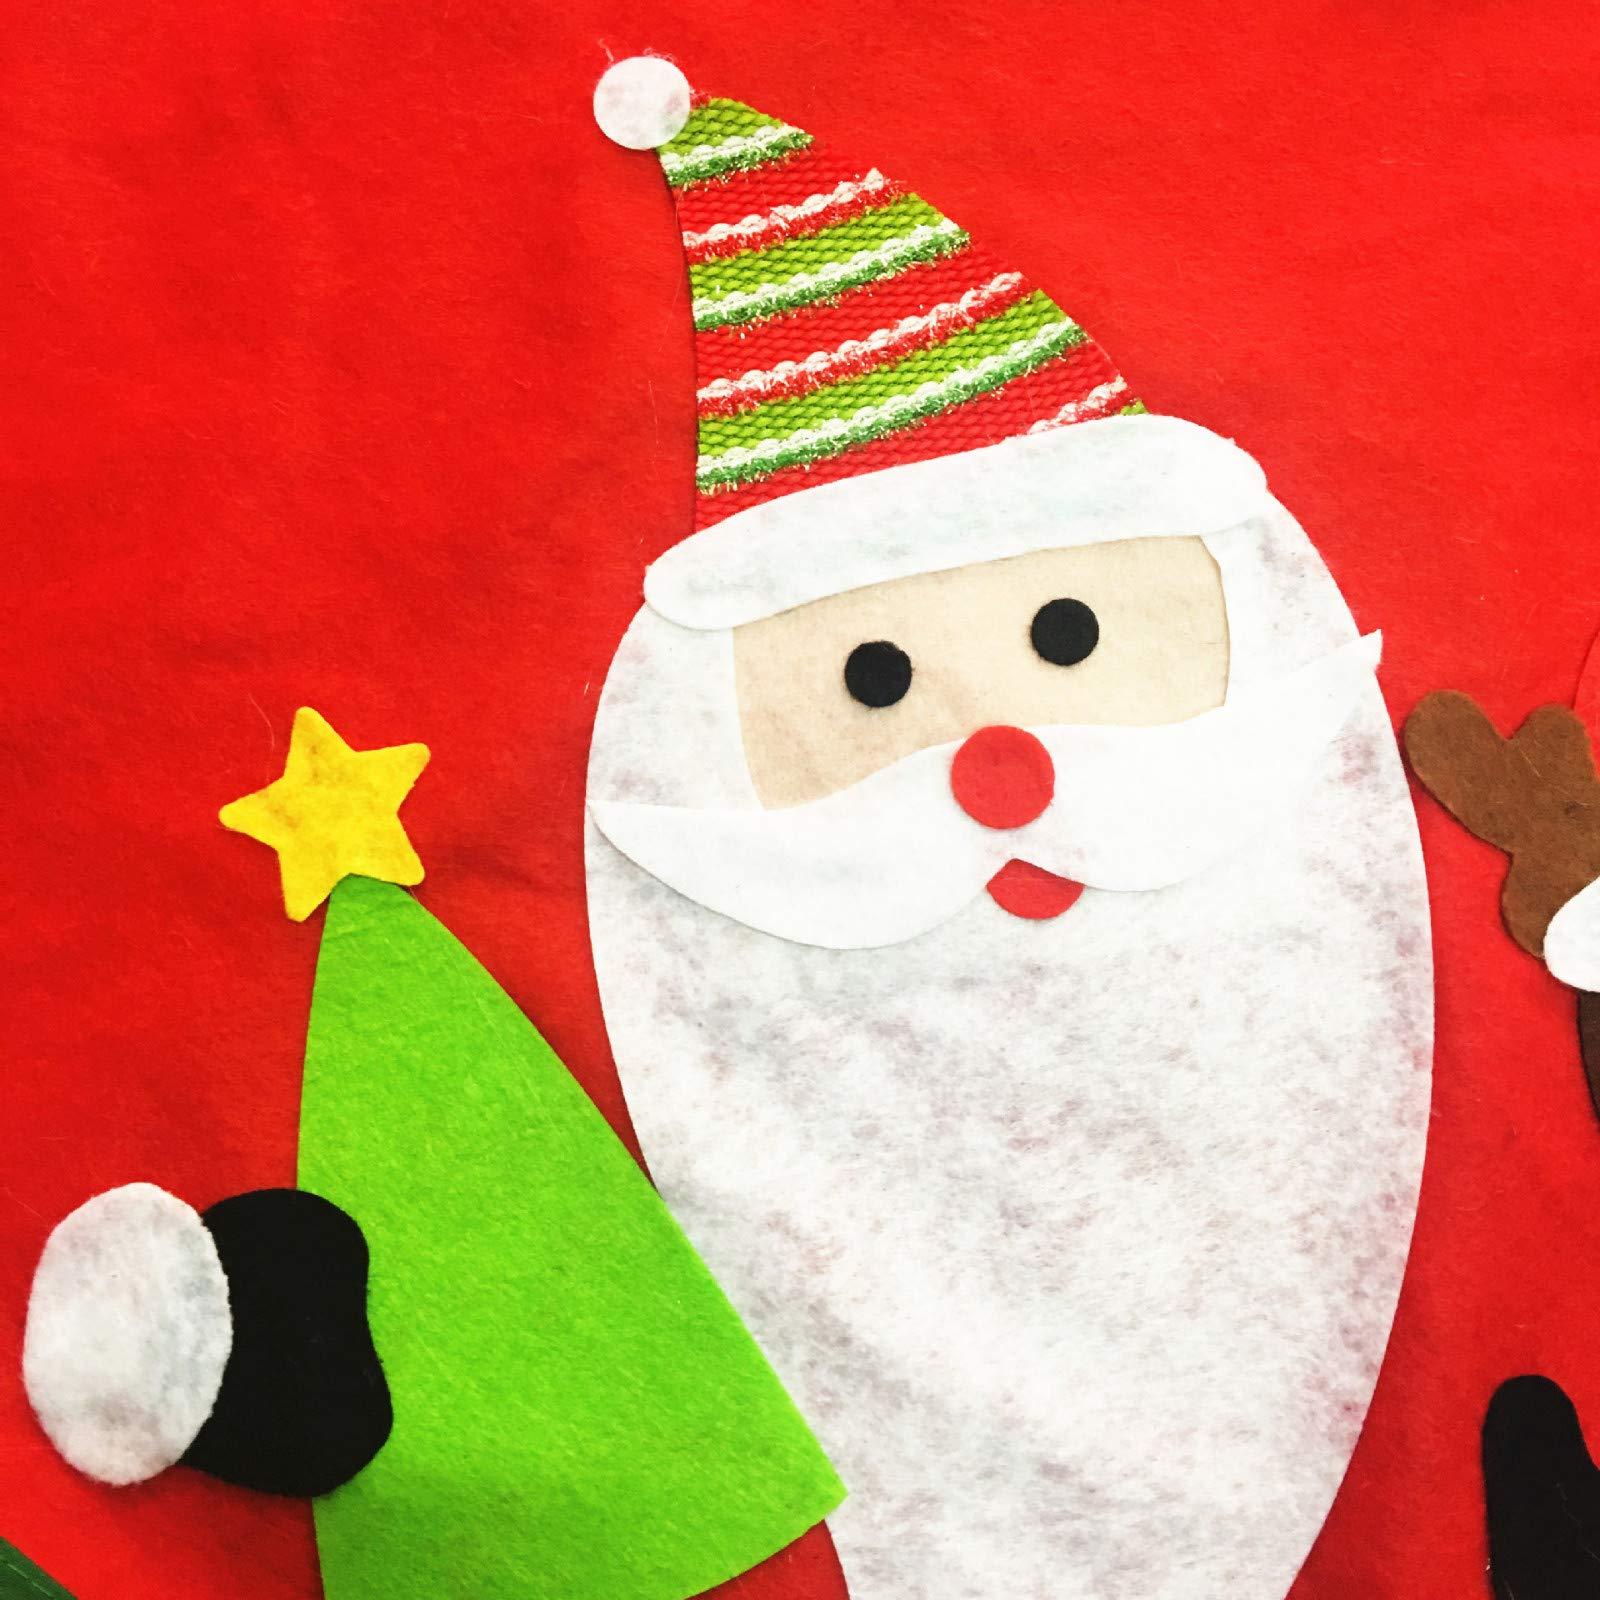 callm Christmas Tree Skirt,90cm Country Christmas Red Whimsical Santa Christmas Tree Skirt (Red)